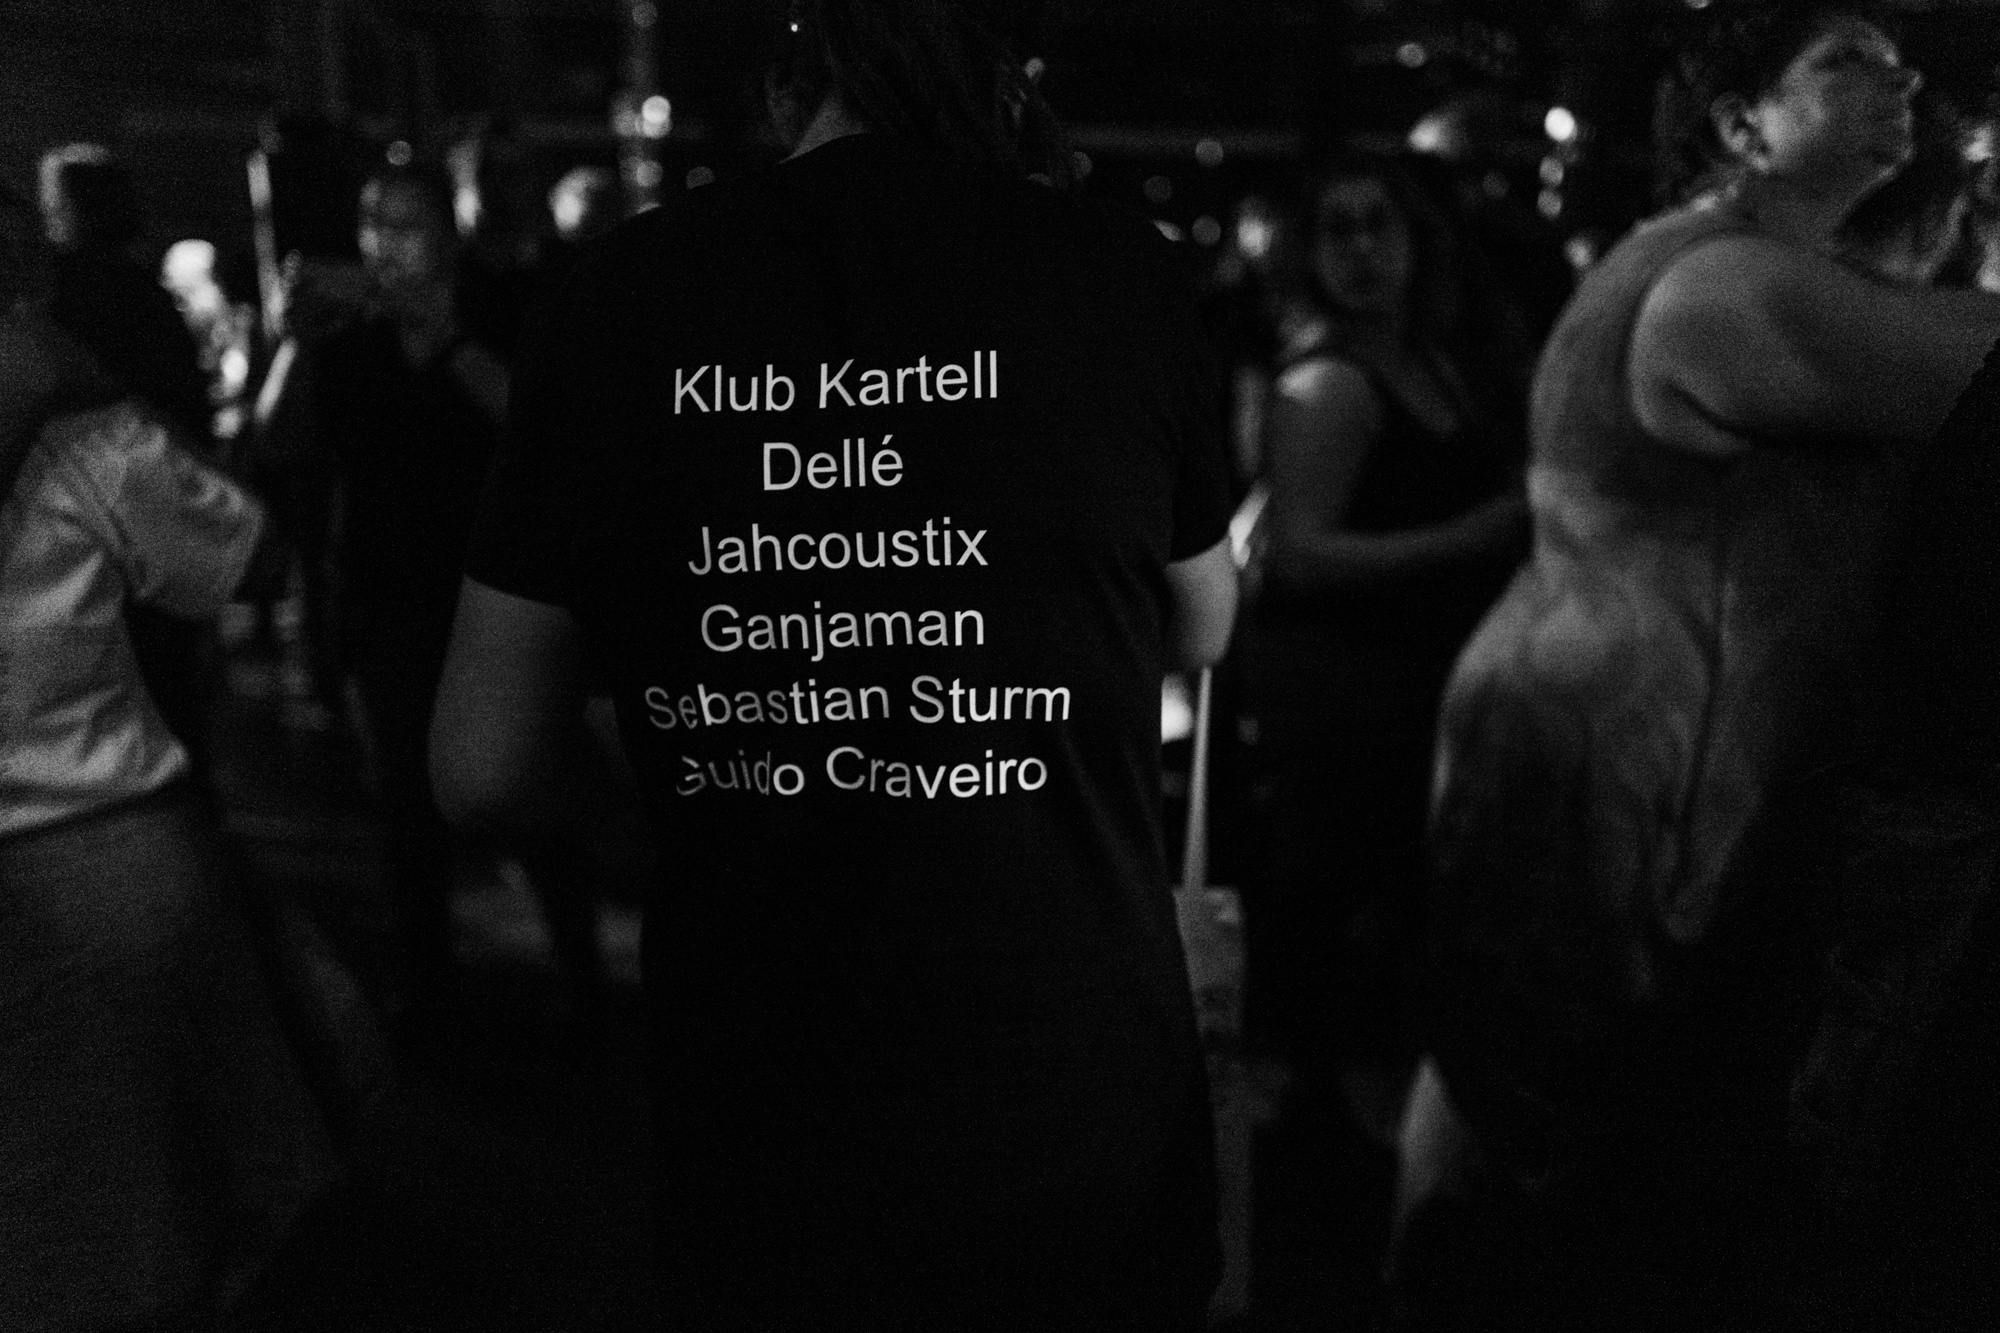 Klub Kartell-1190304